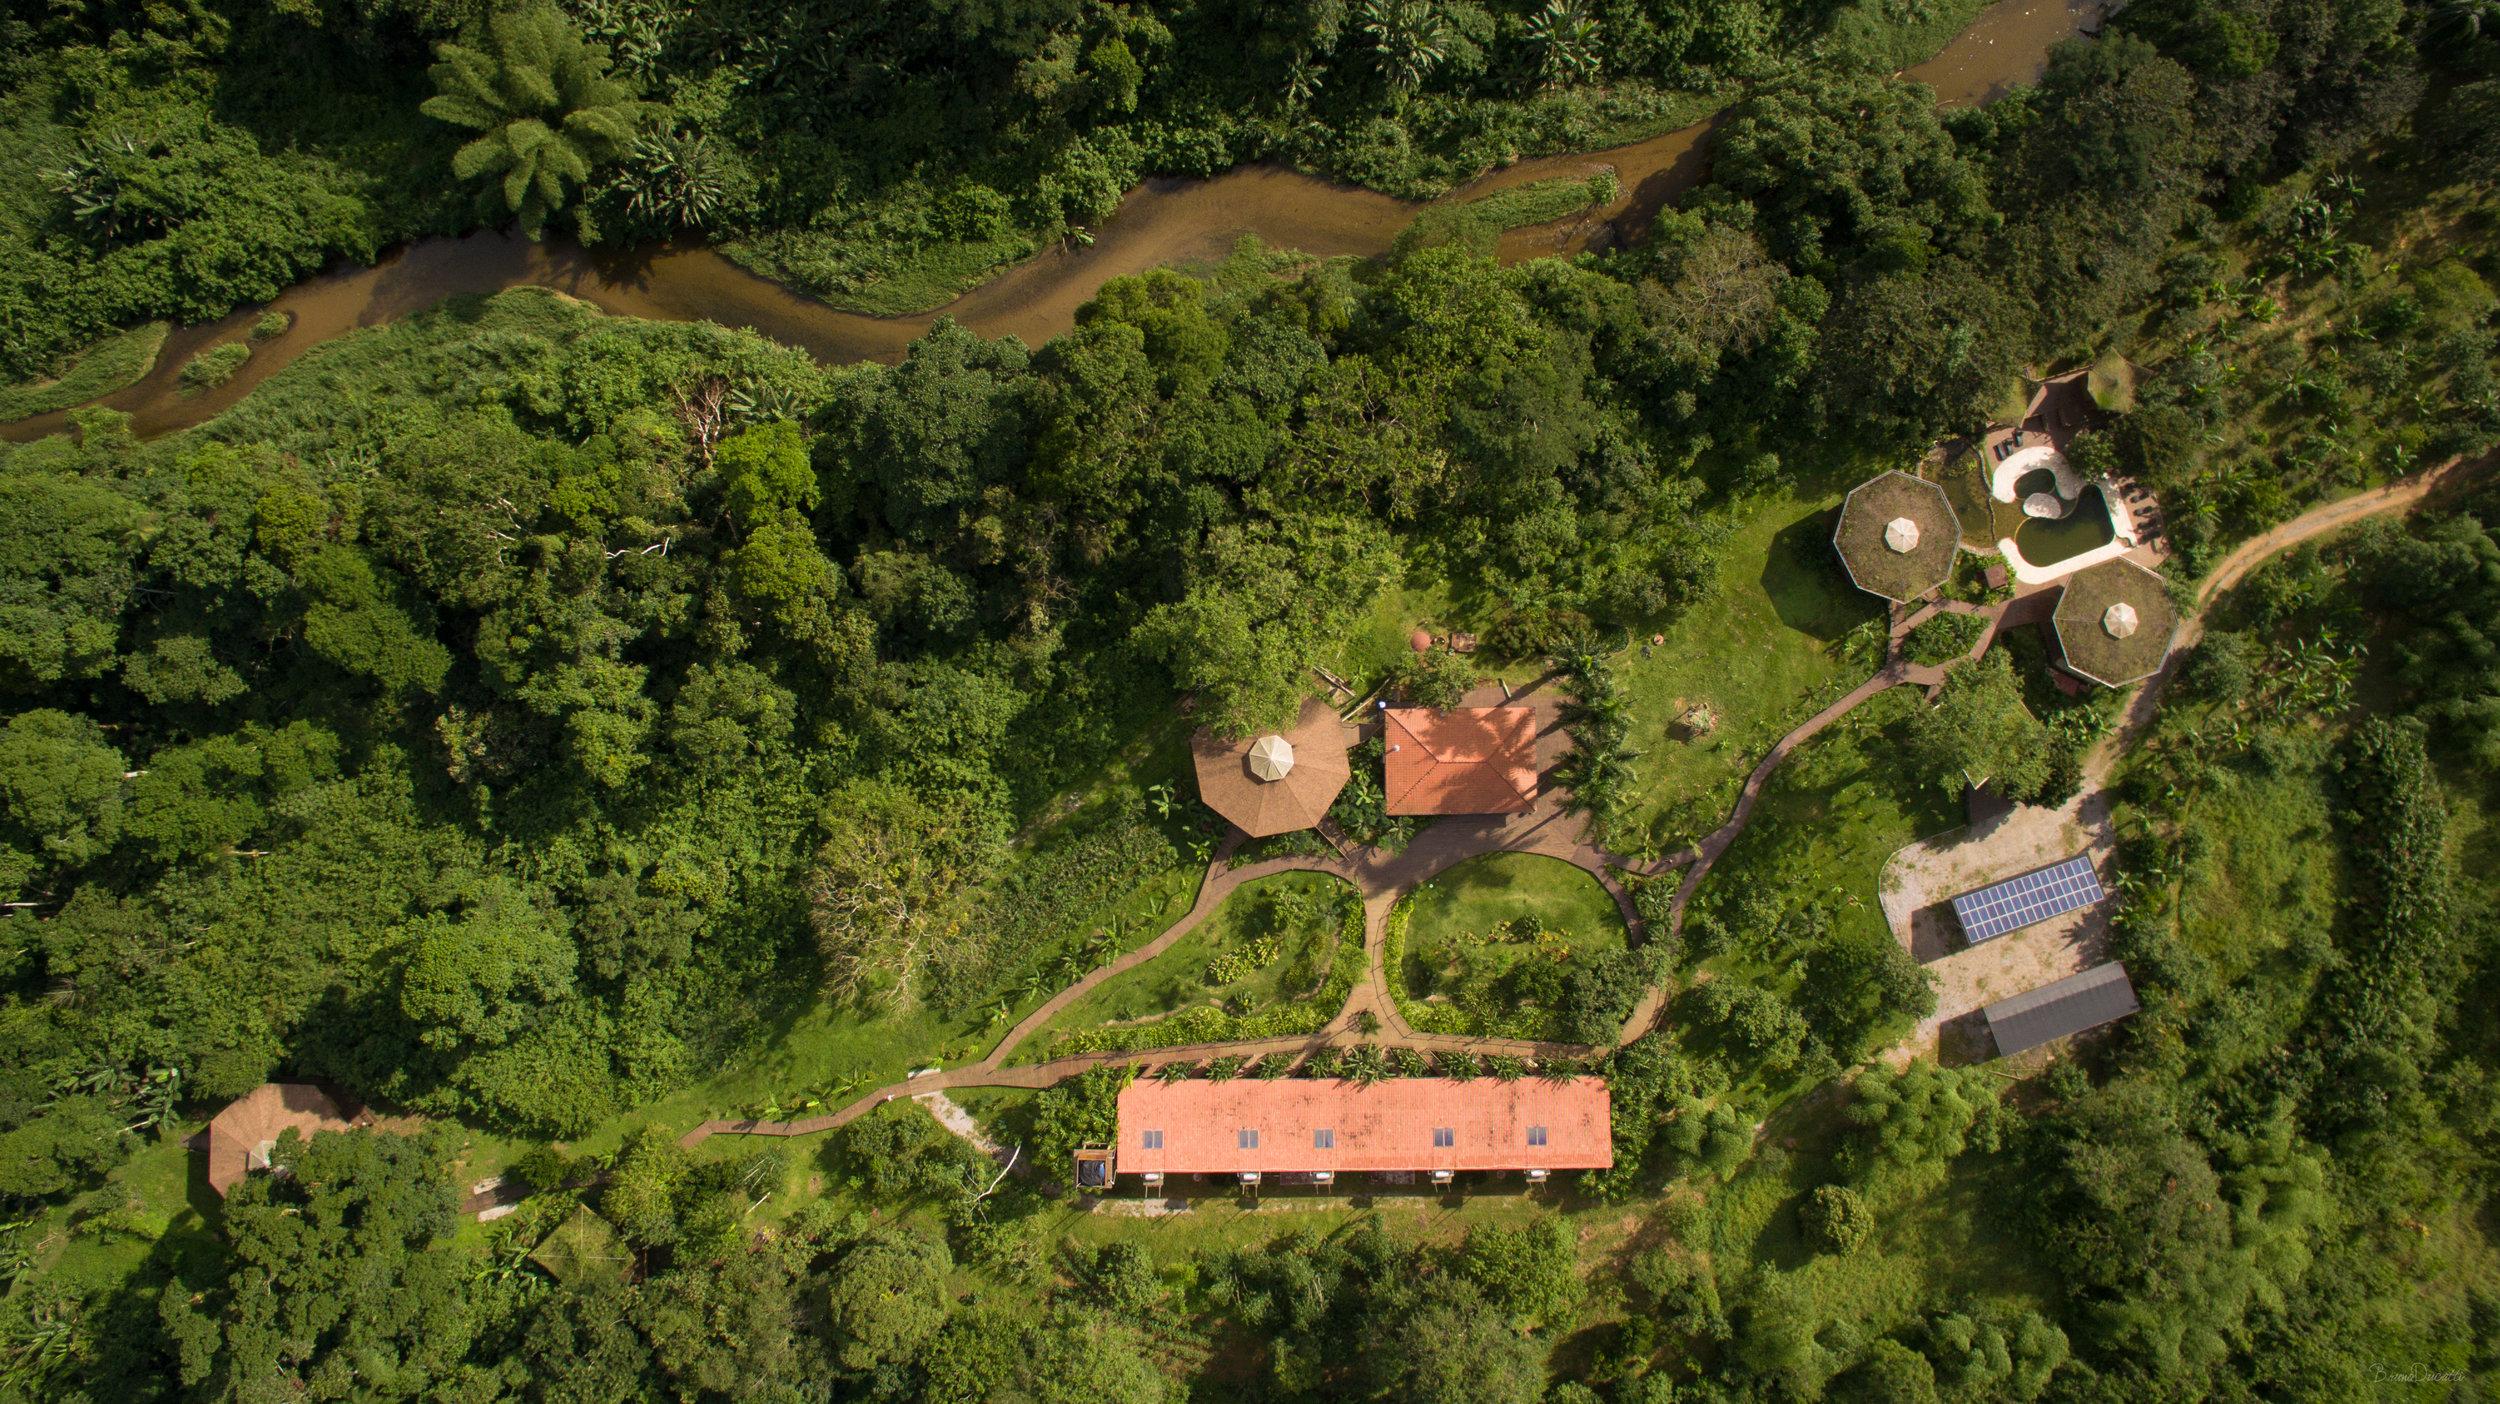 Ecobananal_aereo.jpg